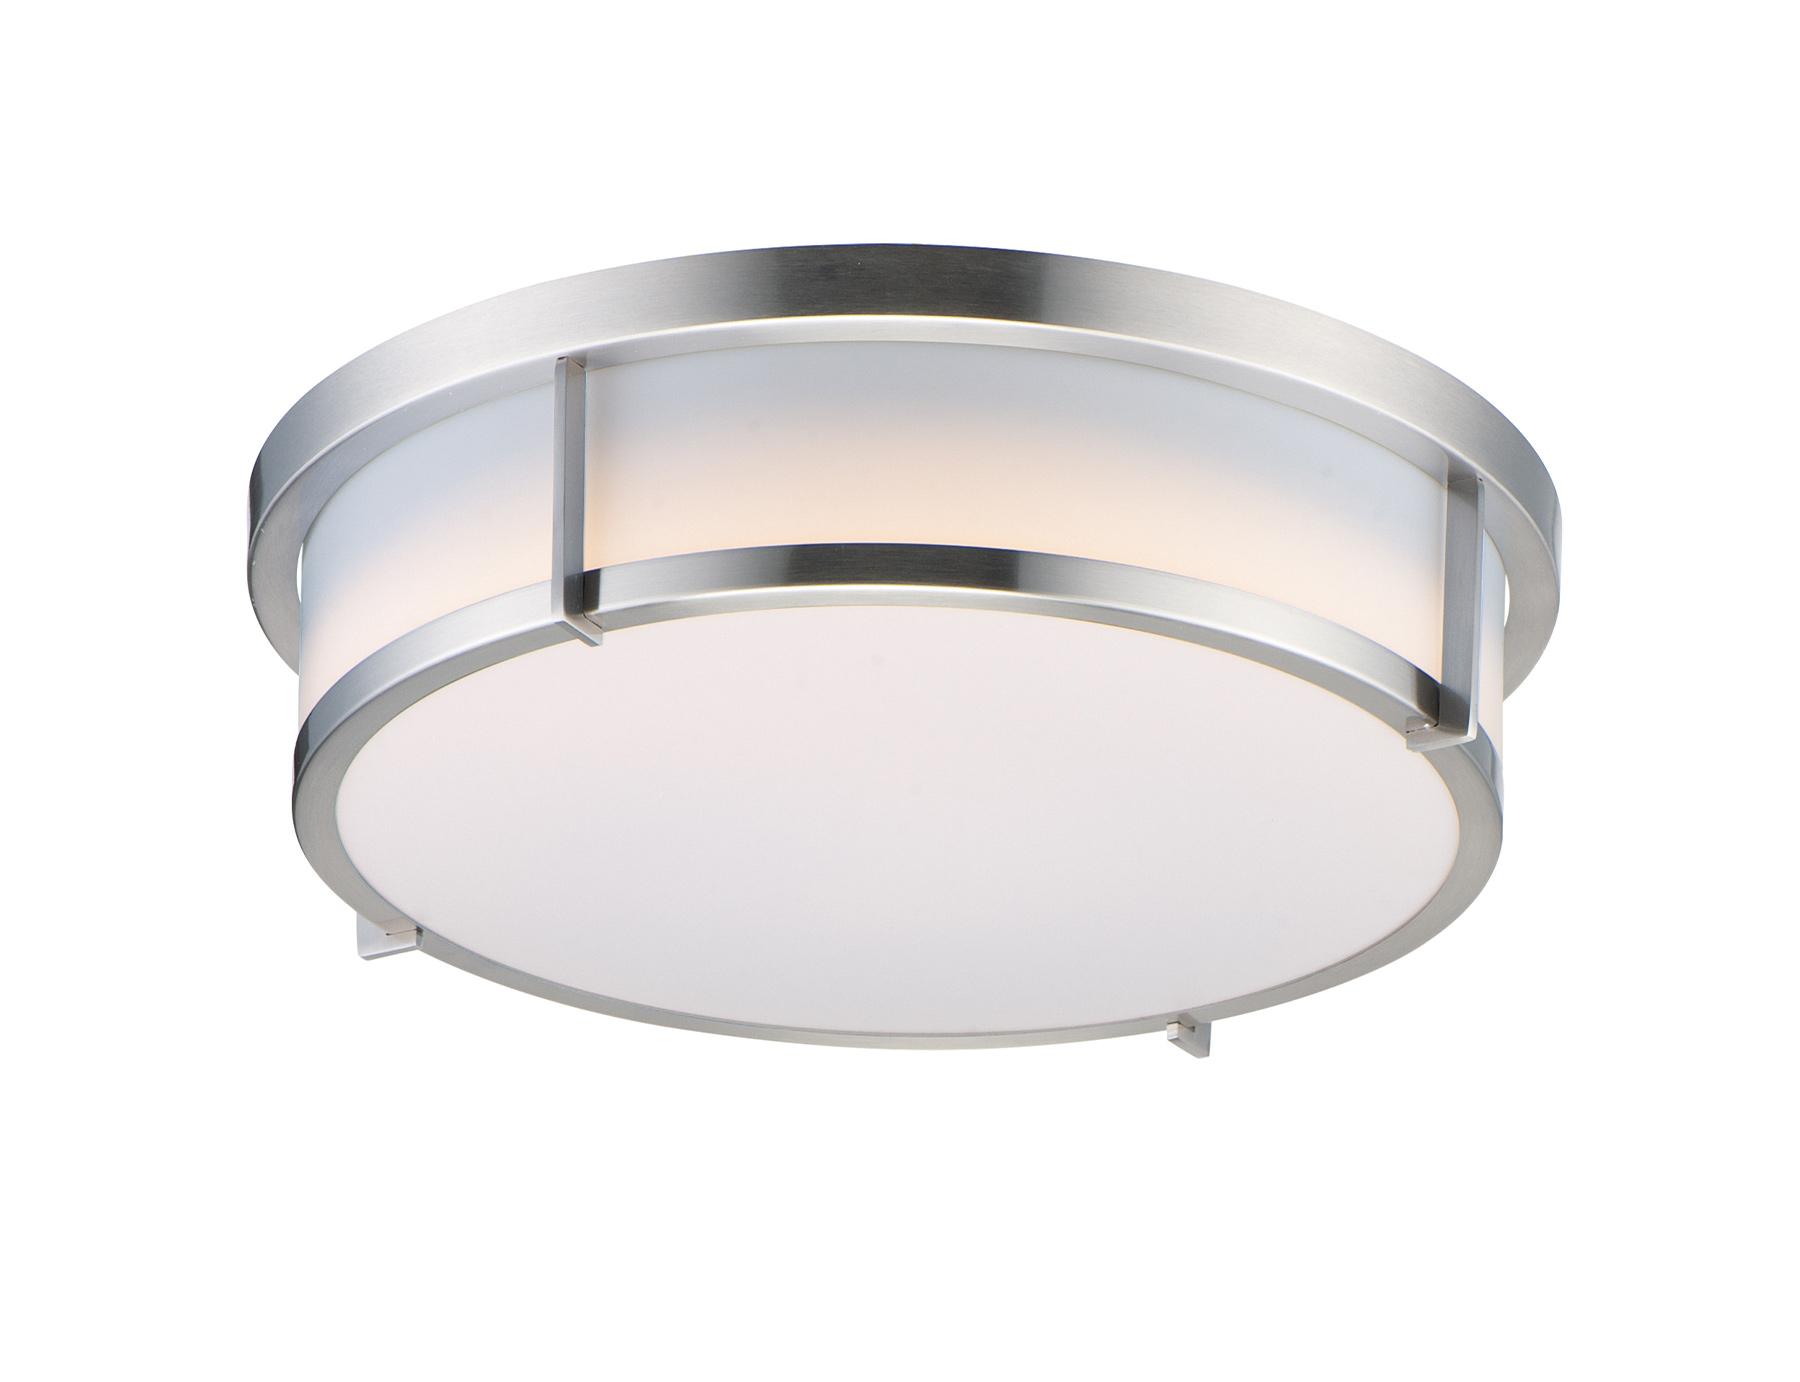 Rogue LED Flush Mount | Maxim Lighting